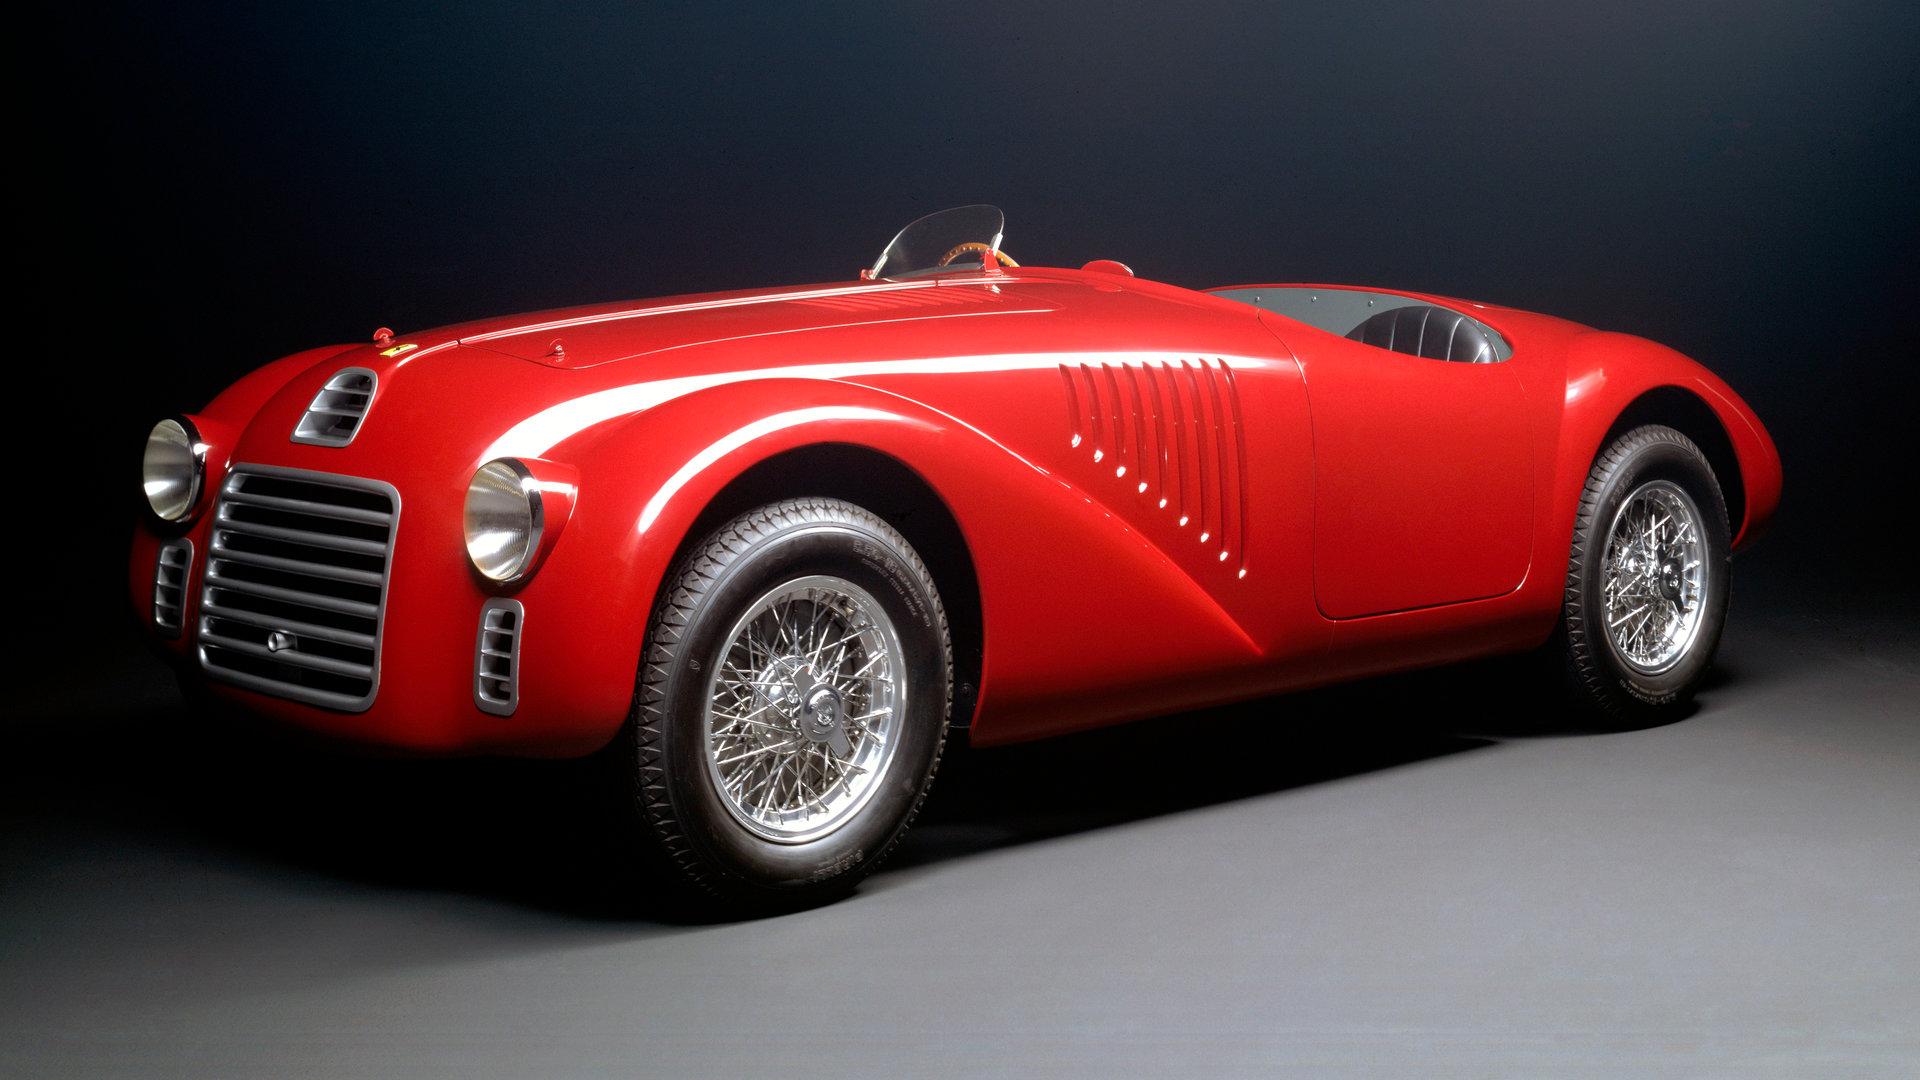 Coche del día: Ferrari 125 S